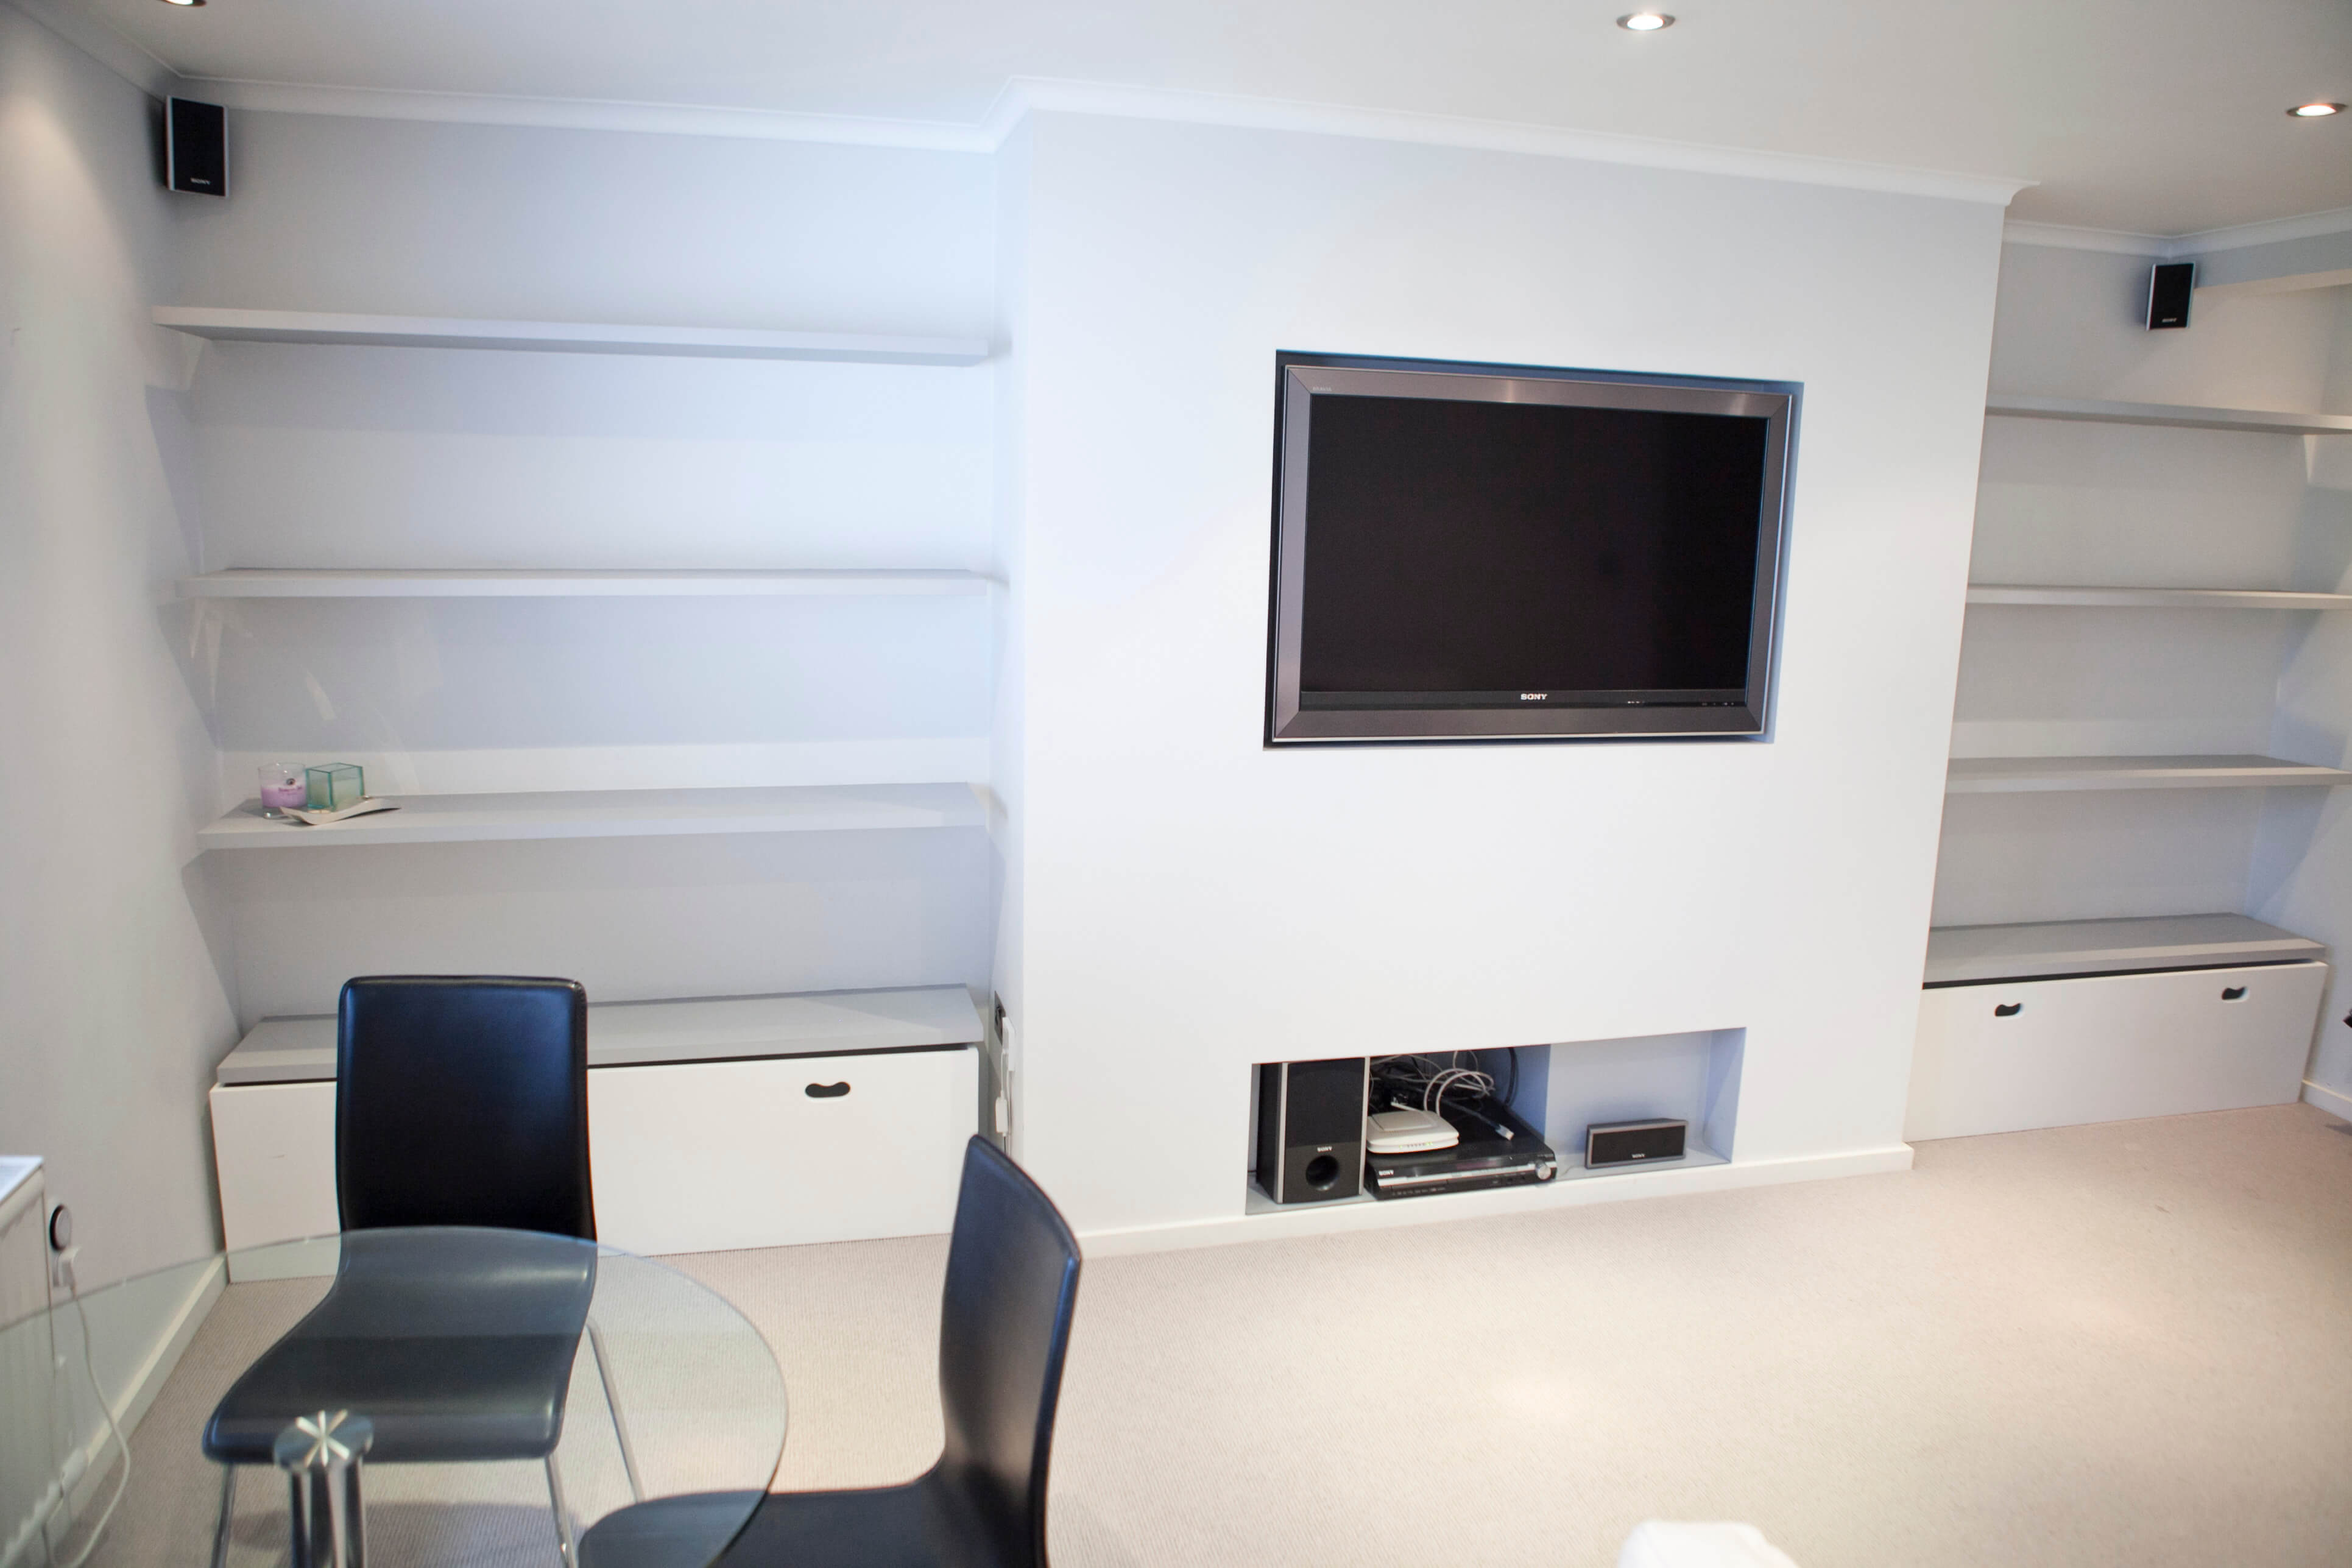 IMG 31121 - Flats & Apartments